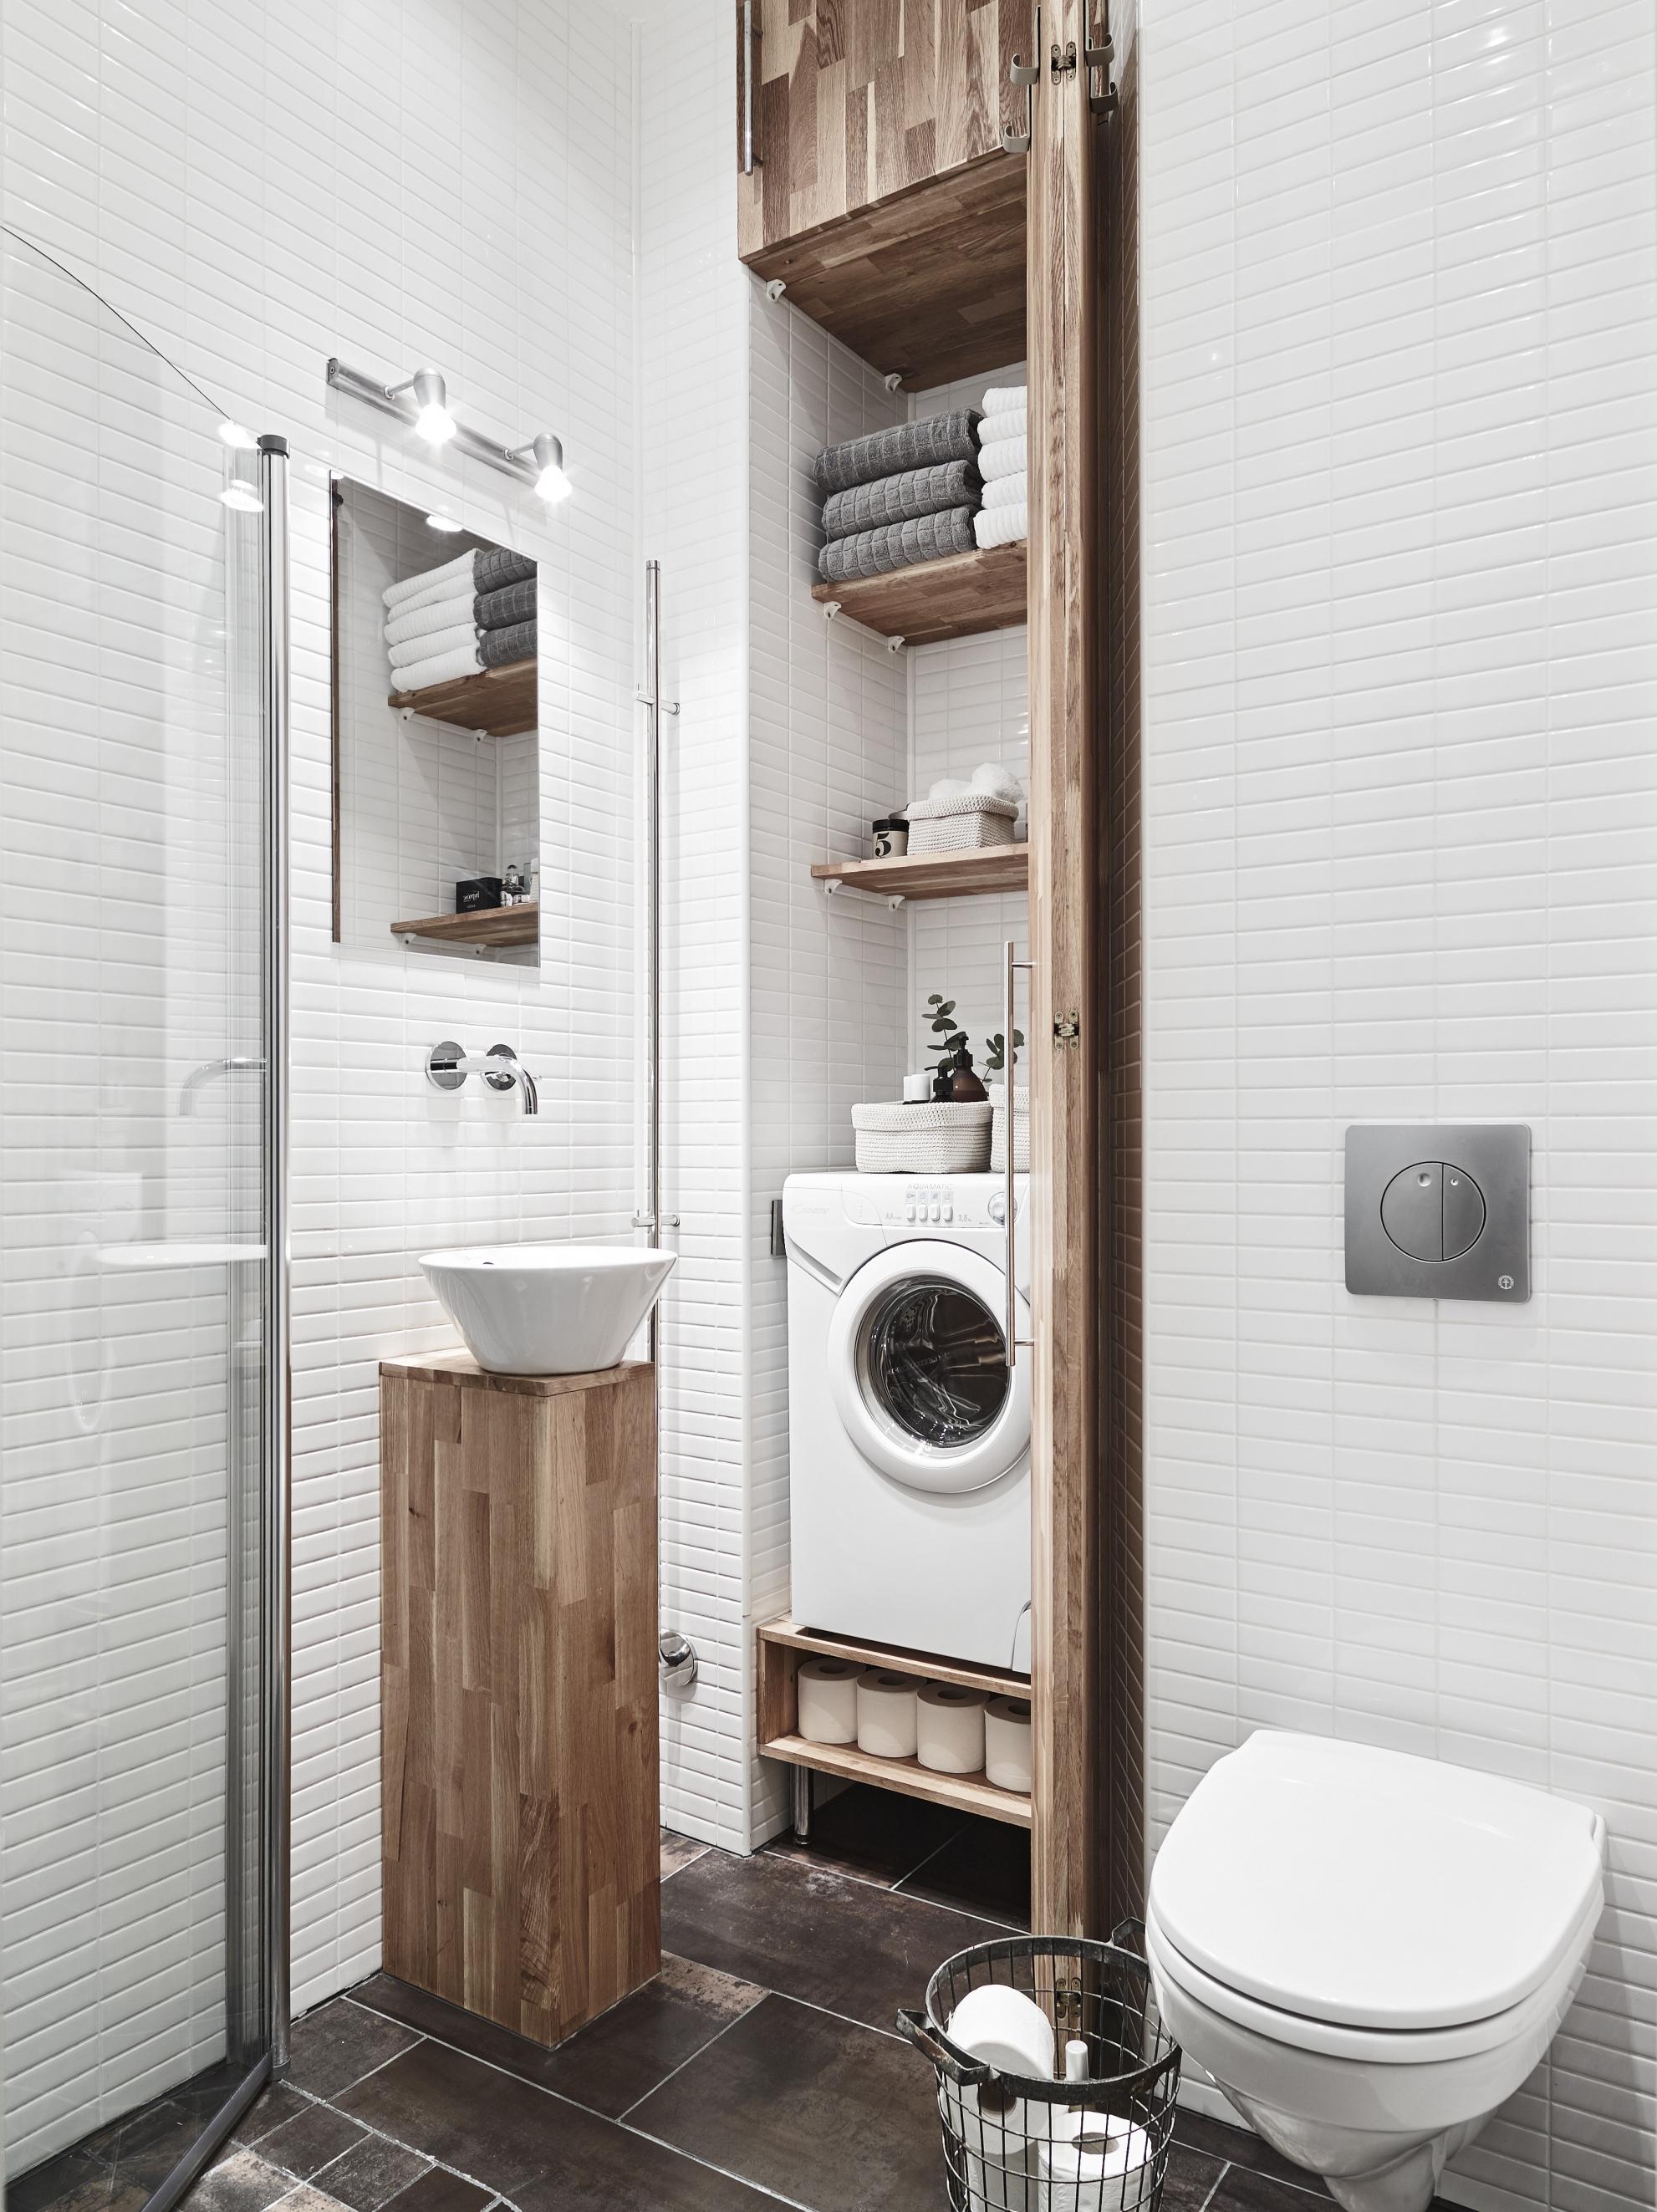 interjero id jos ma am vonios kambariui viskas apie interjer. Black Bedroom Furniture Sets. Home Design Ideas